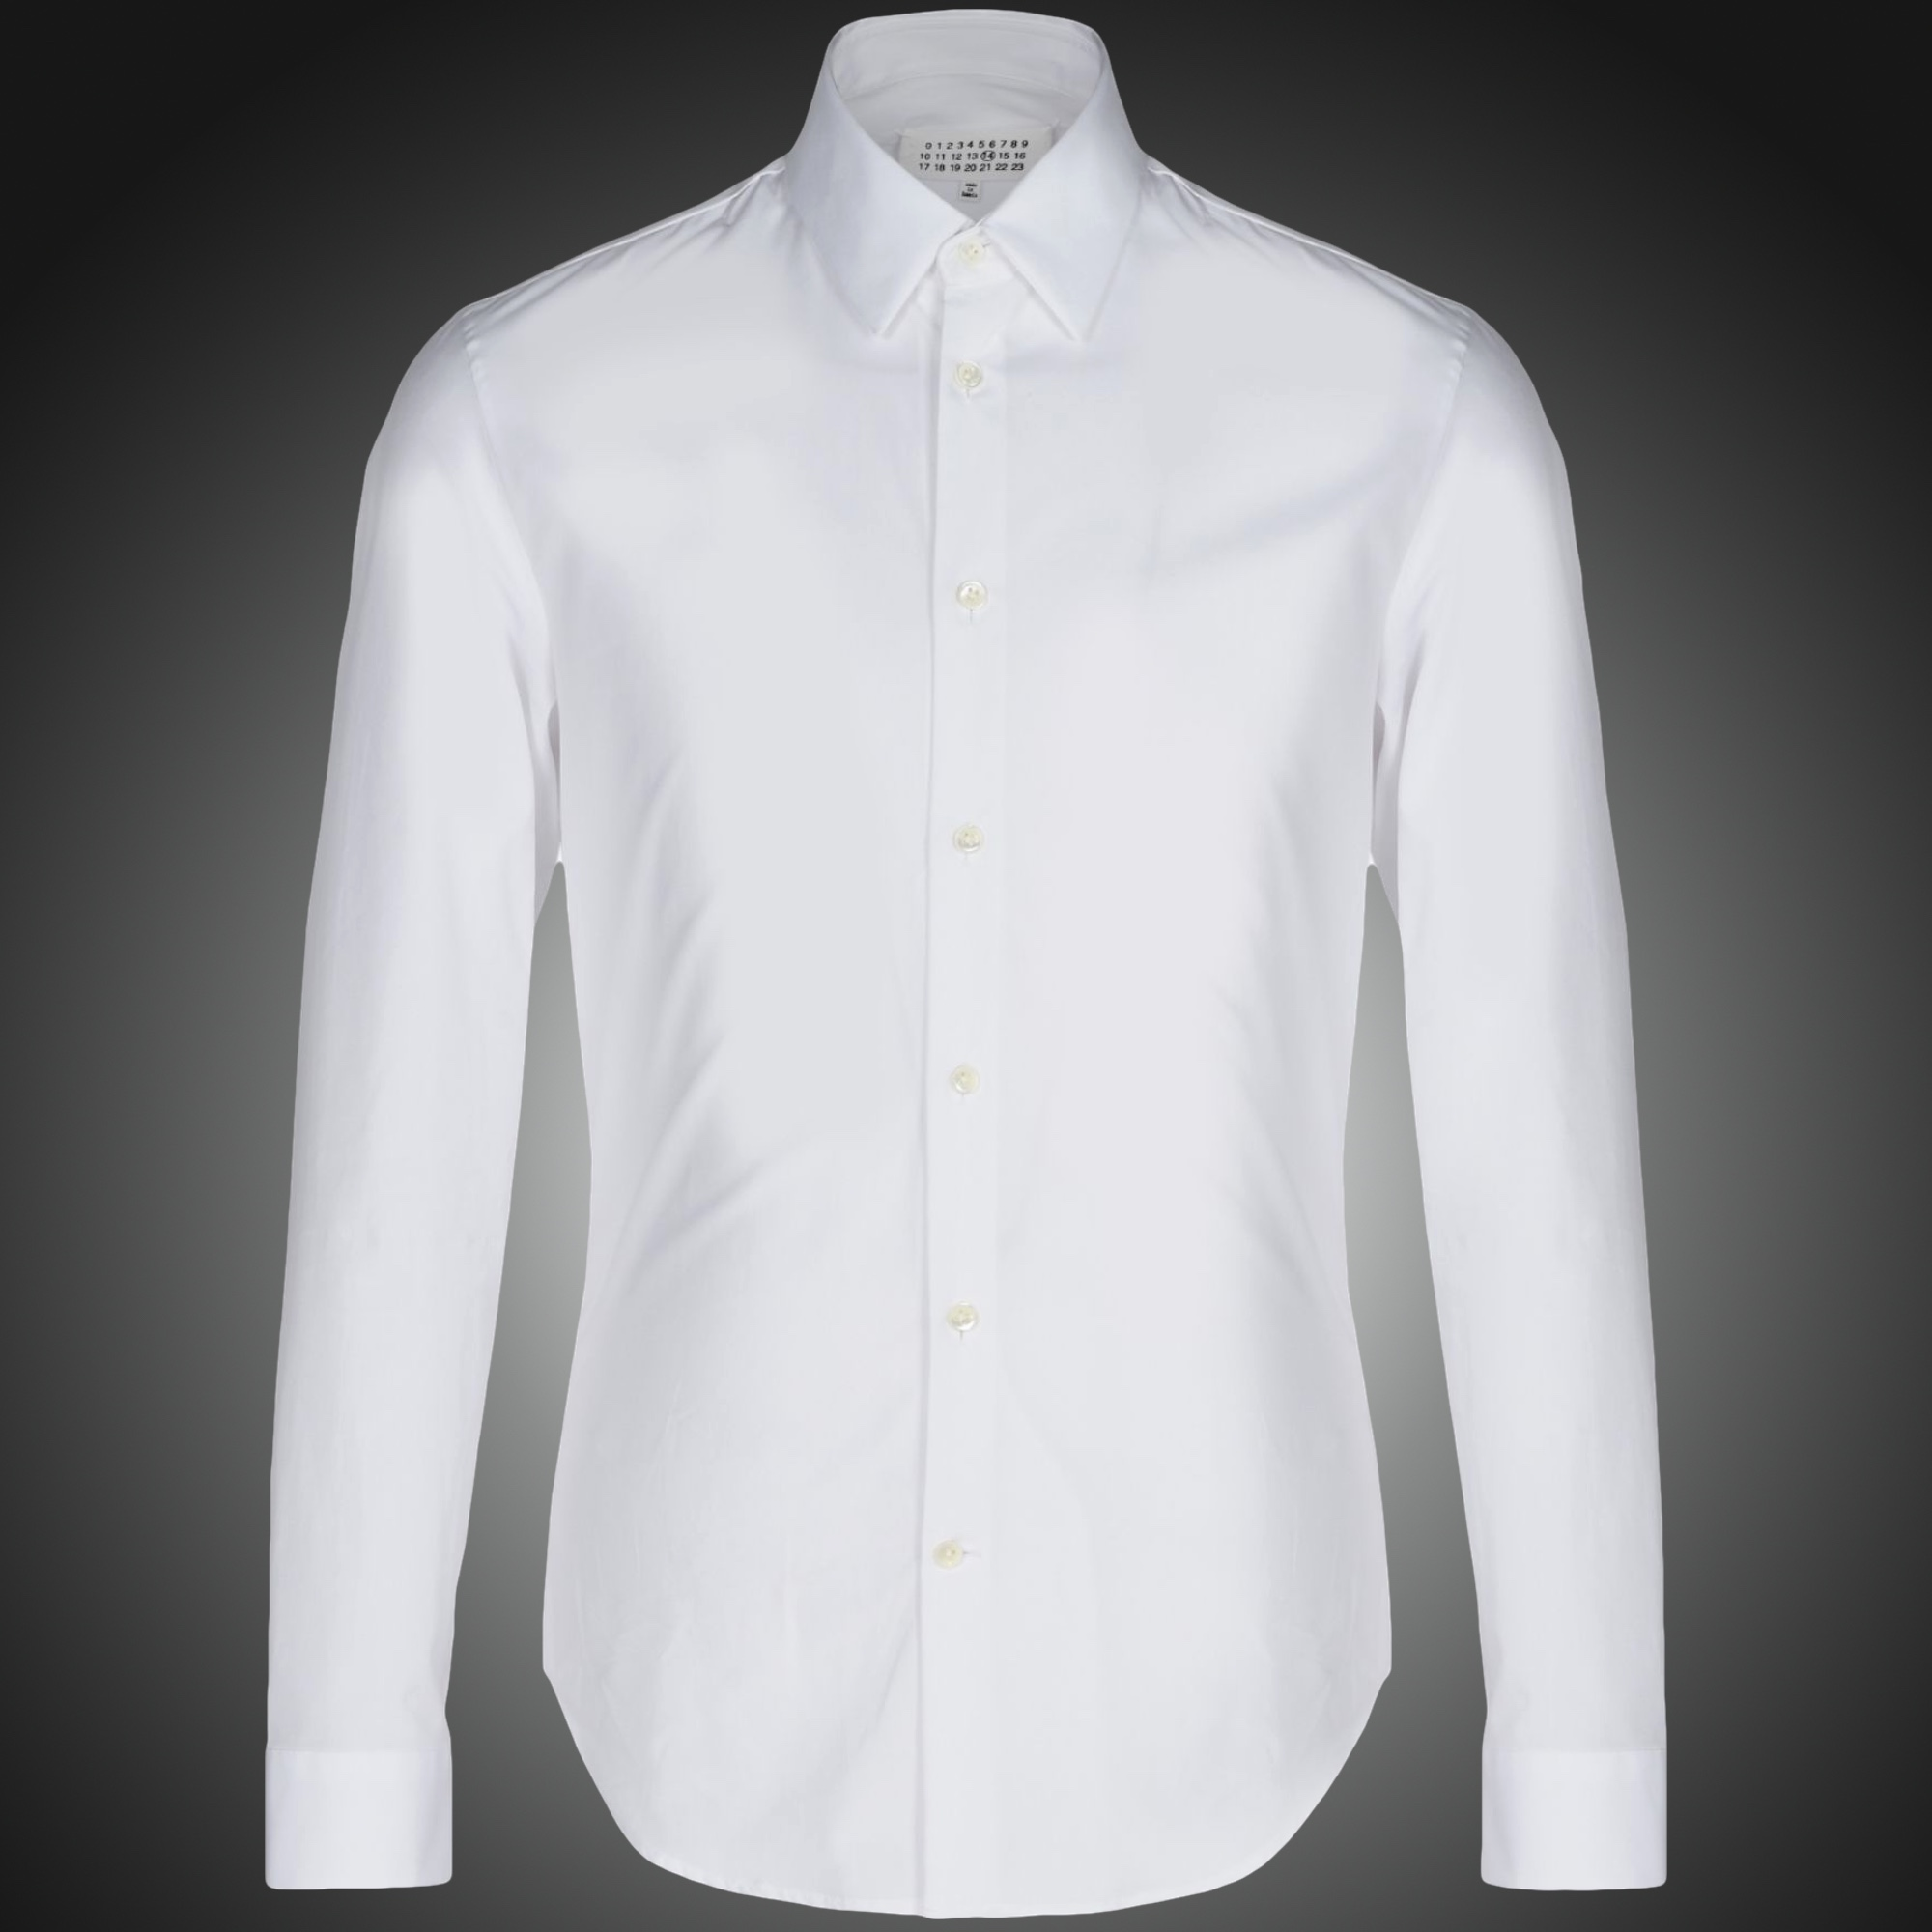 maison margiela white shirt.jpg